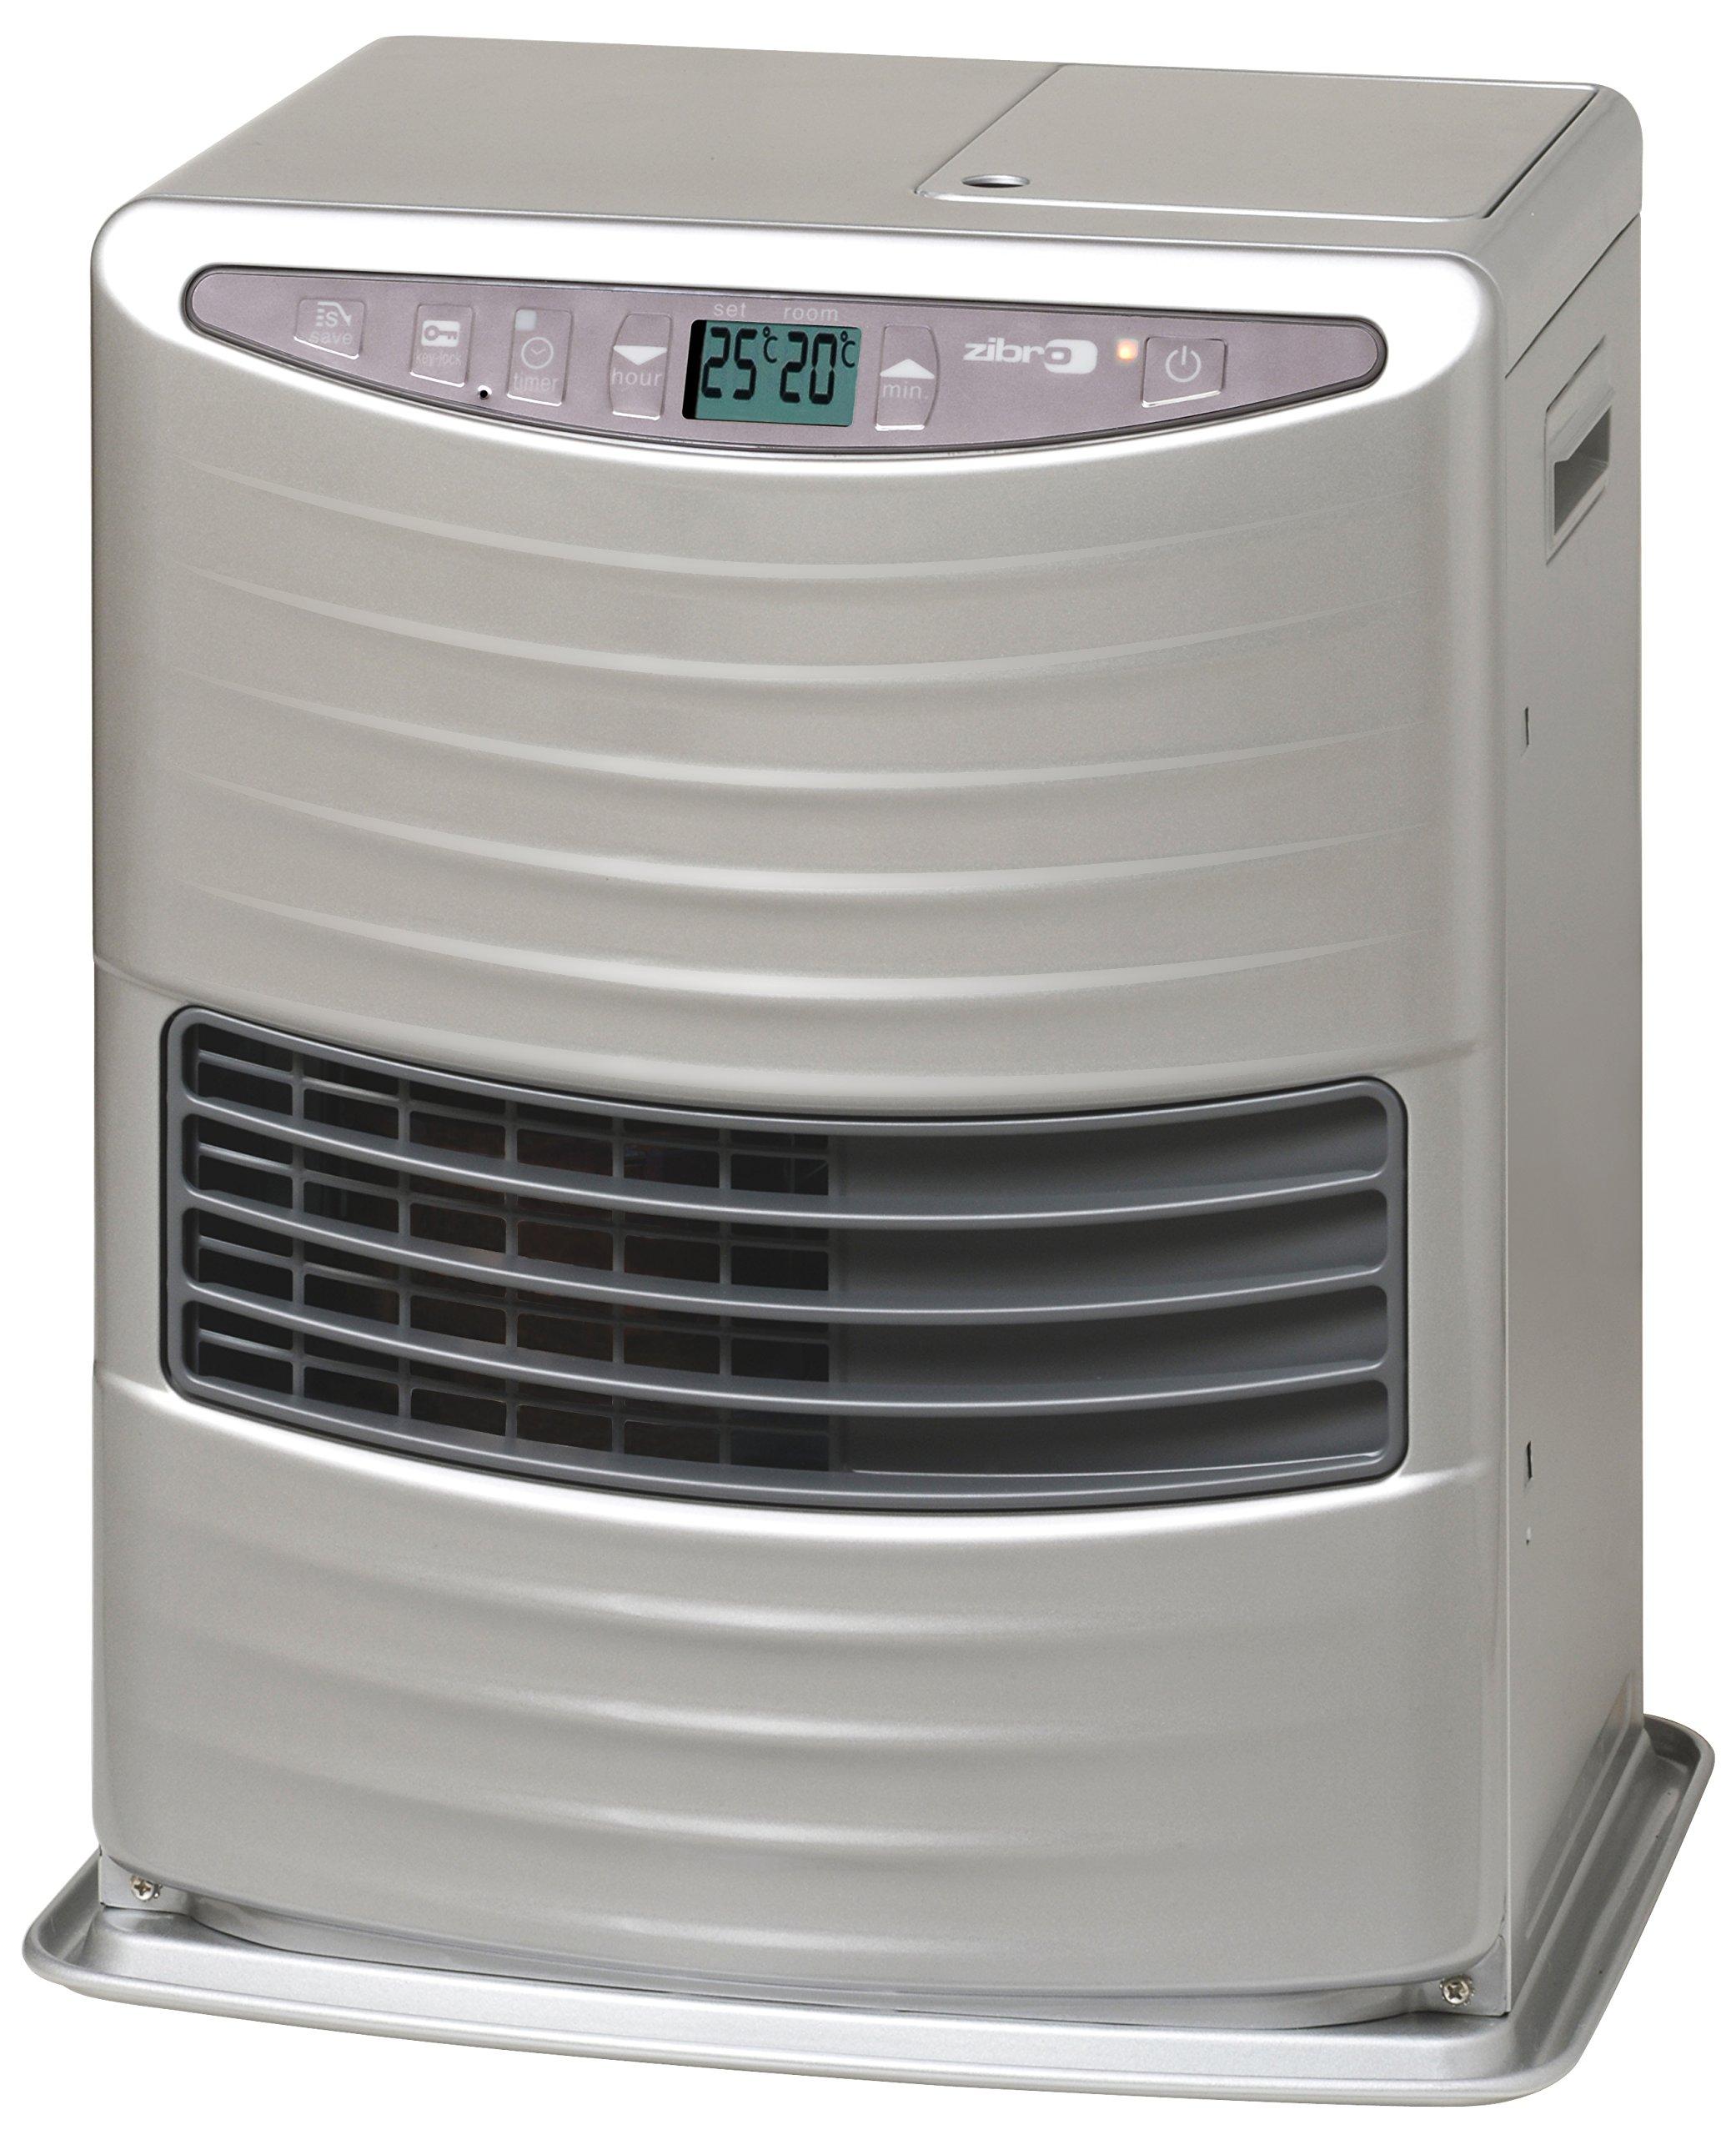 Zibro R, Lc 30 3000 wattsW product image